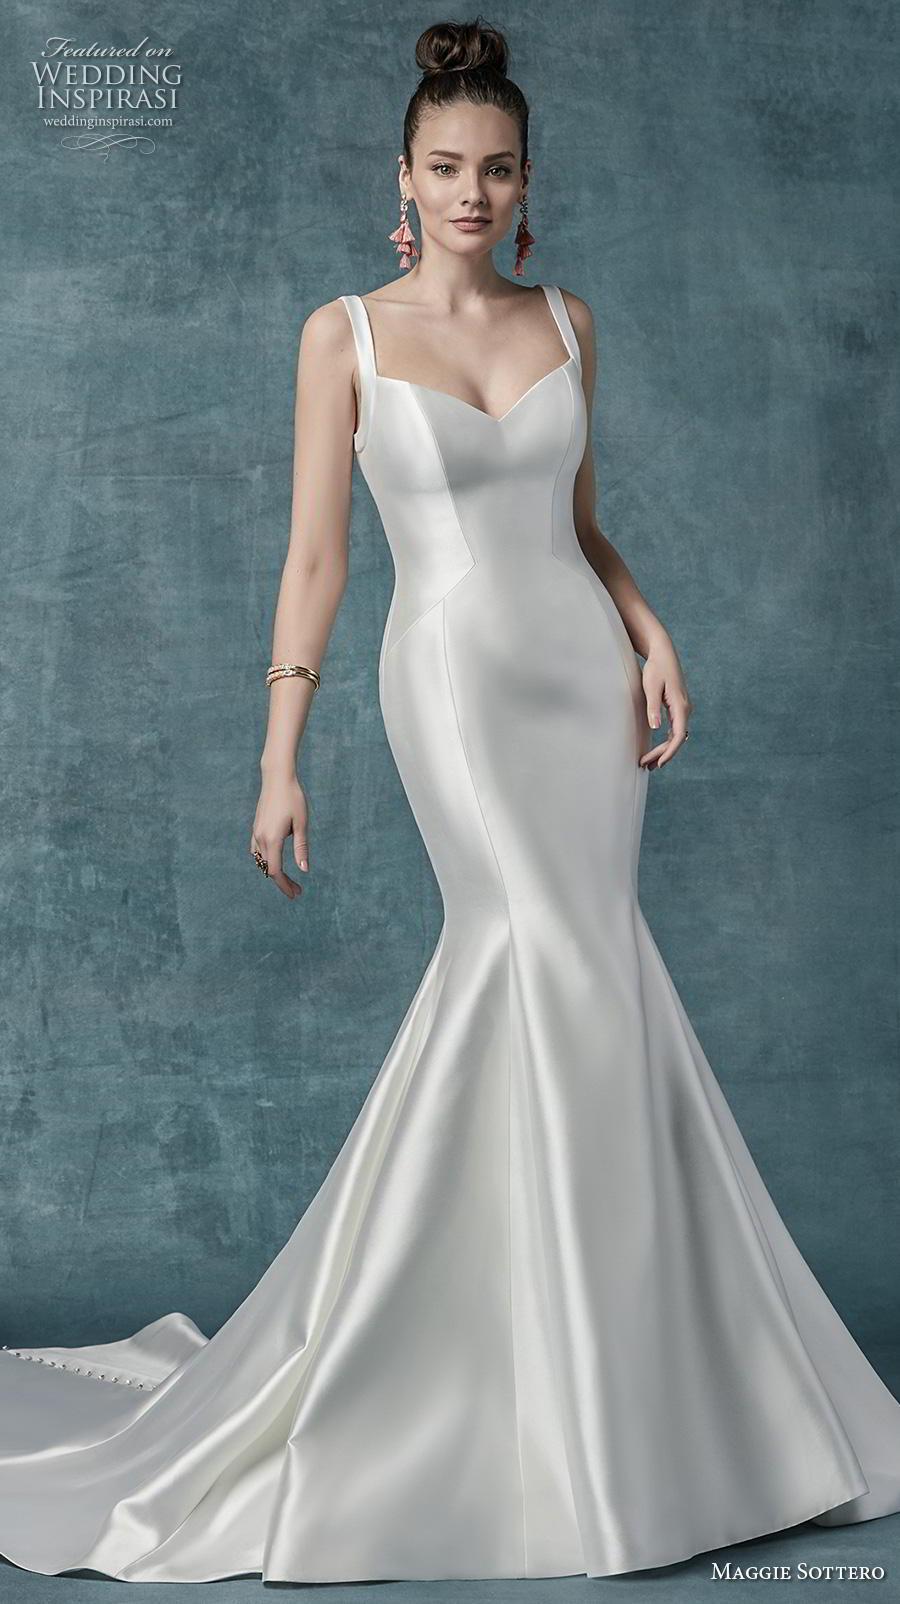 ddb04398b74 maggie sottero spring 2019 bridal sleeveless with strap diamond neckline  simple minimalist satin elegant mermaid wedding